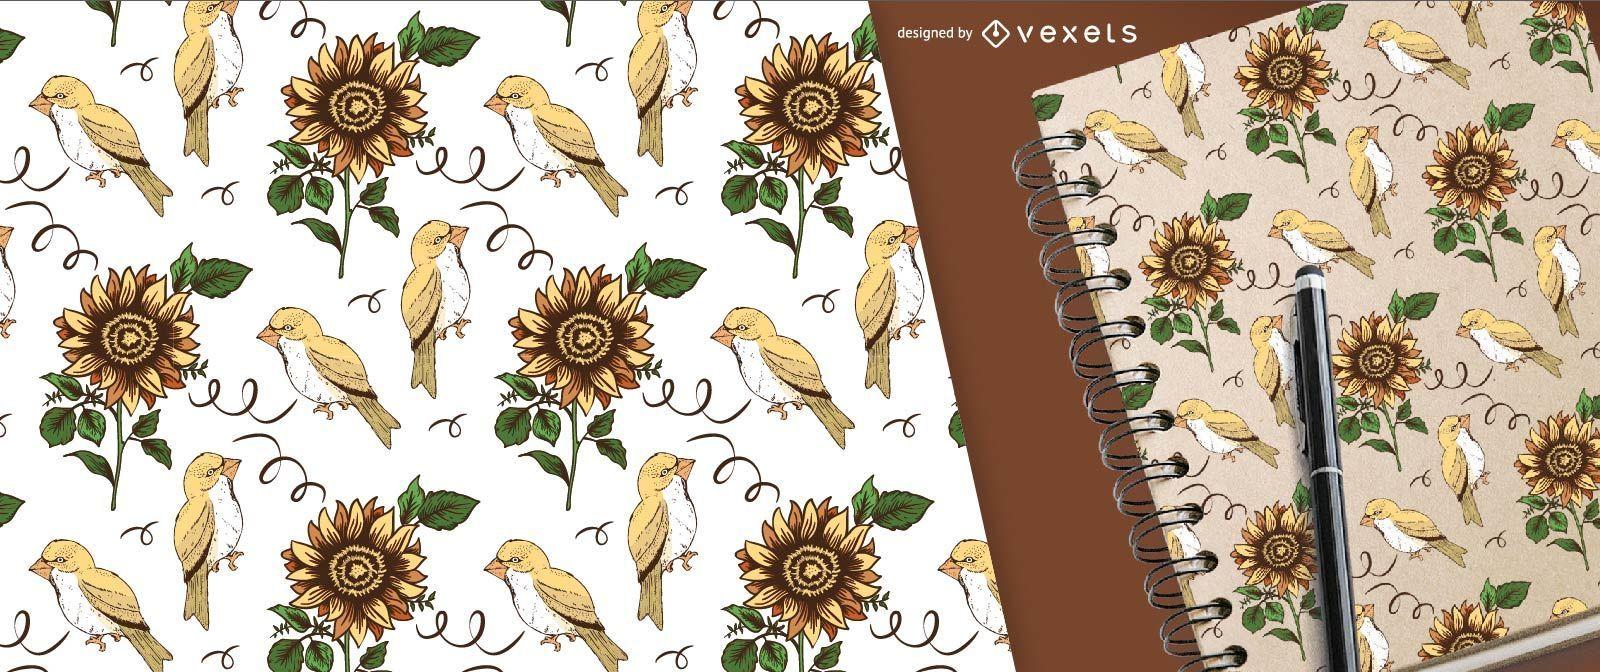 Sunflower and bird pattern for merchandise